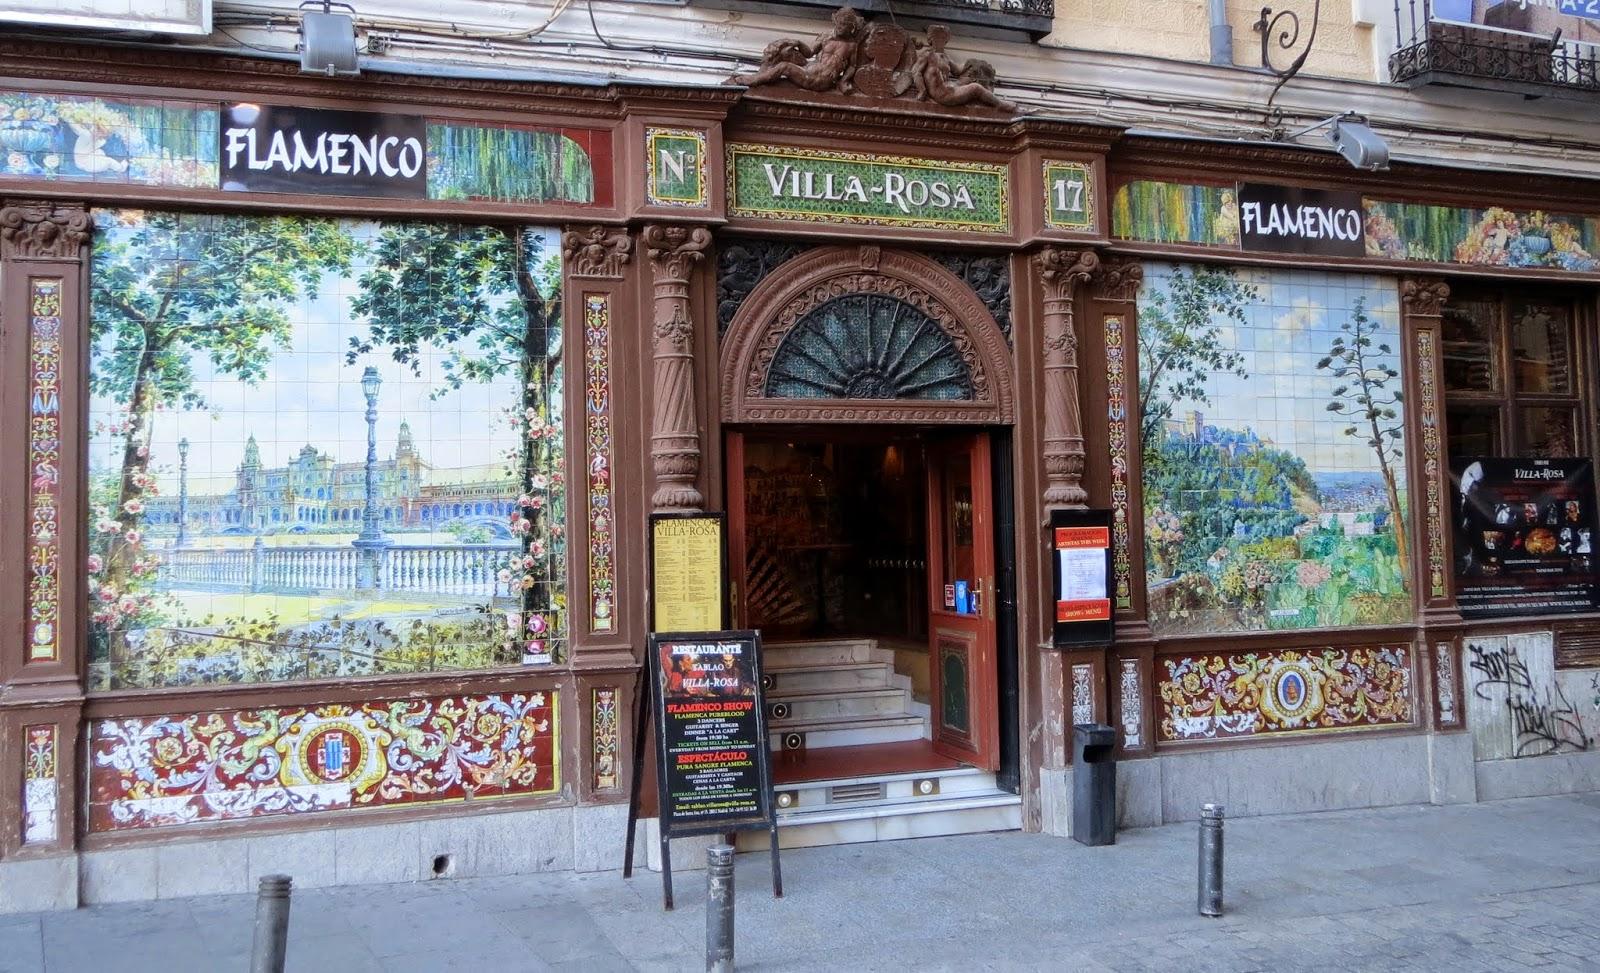 Azulejos Alfonso Romero. Tablao flamenco. Nuñez de Arce